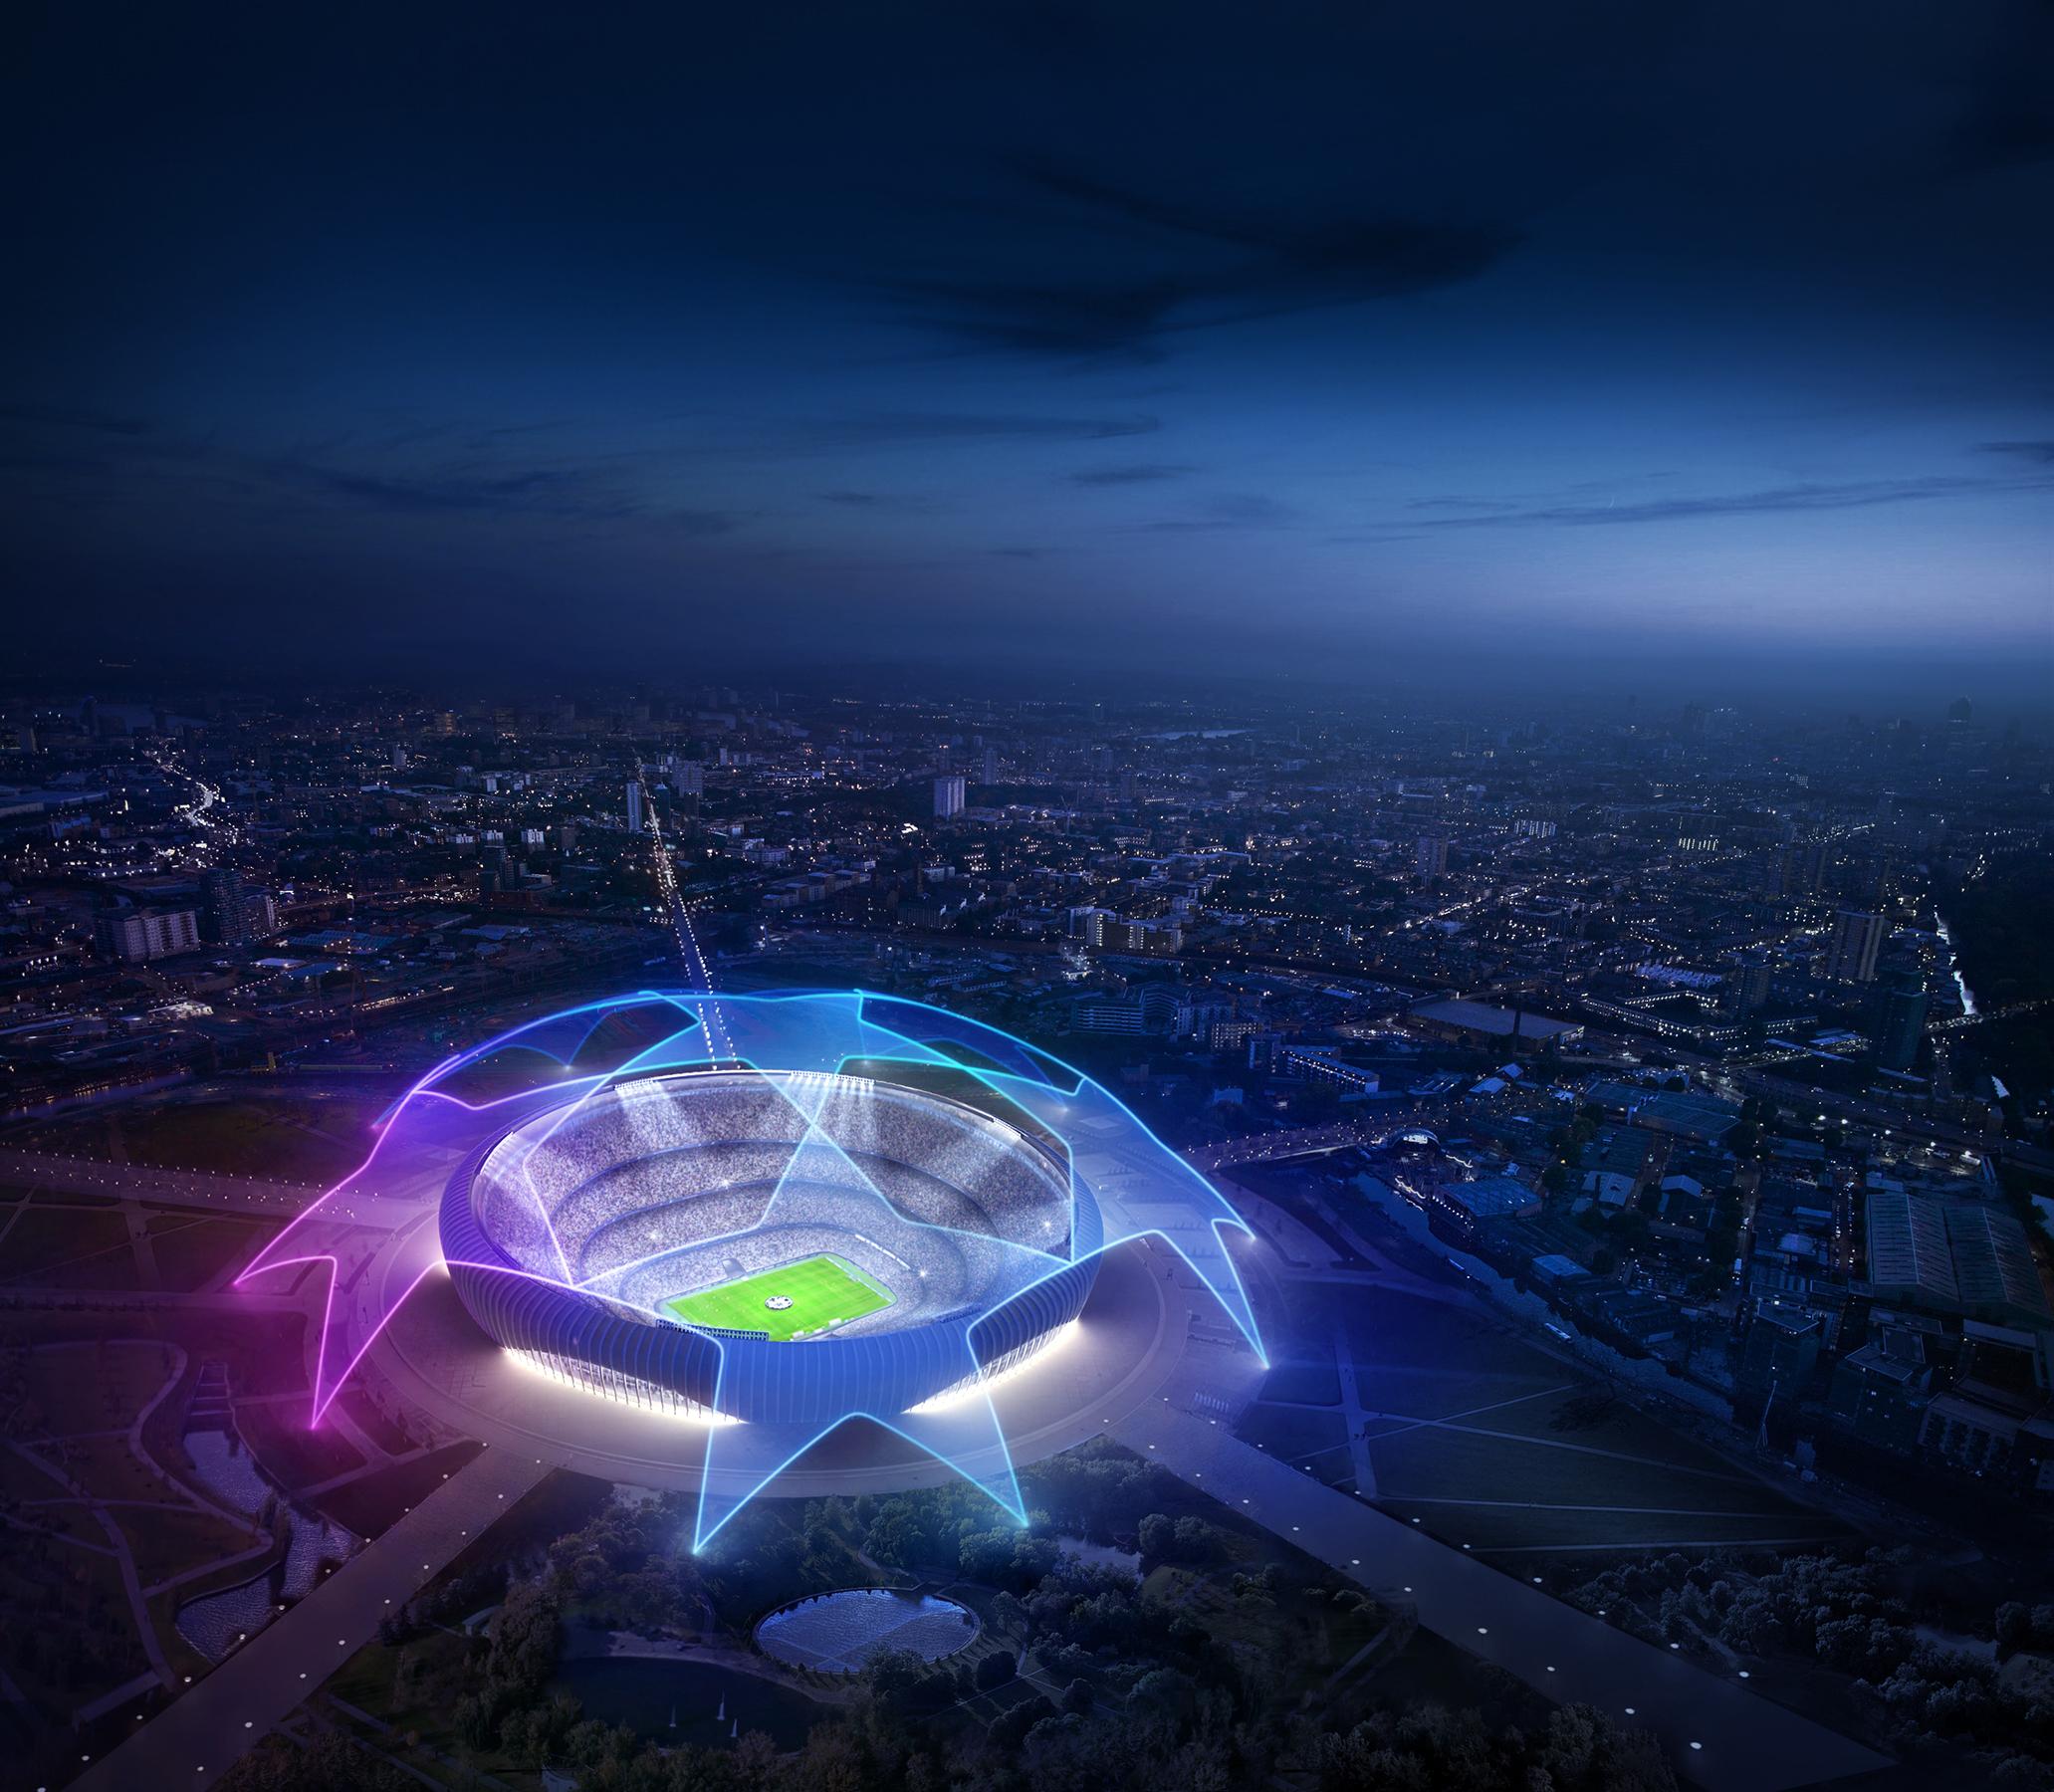 UEFA Champions League - pitch